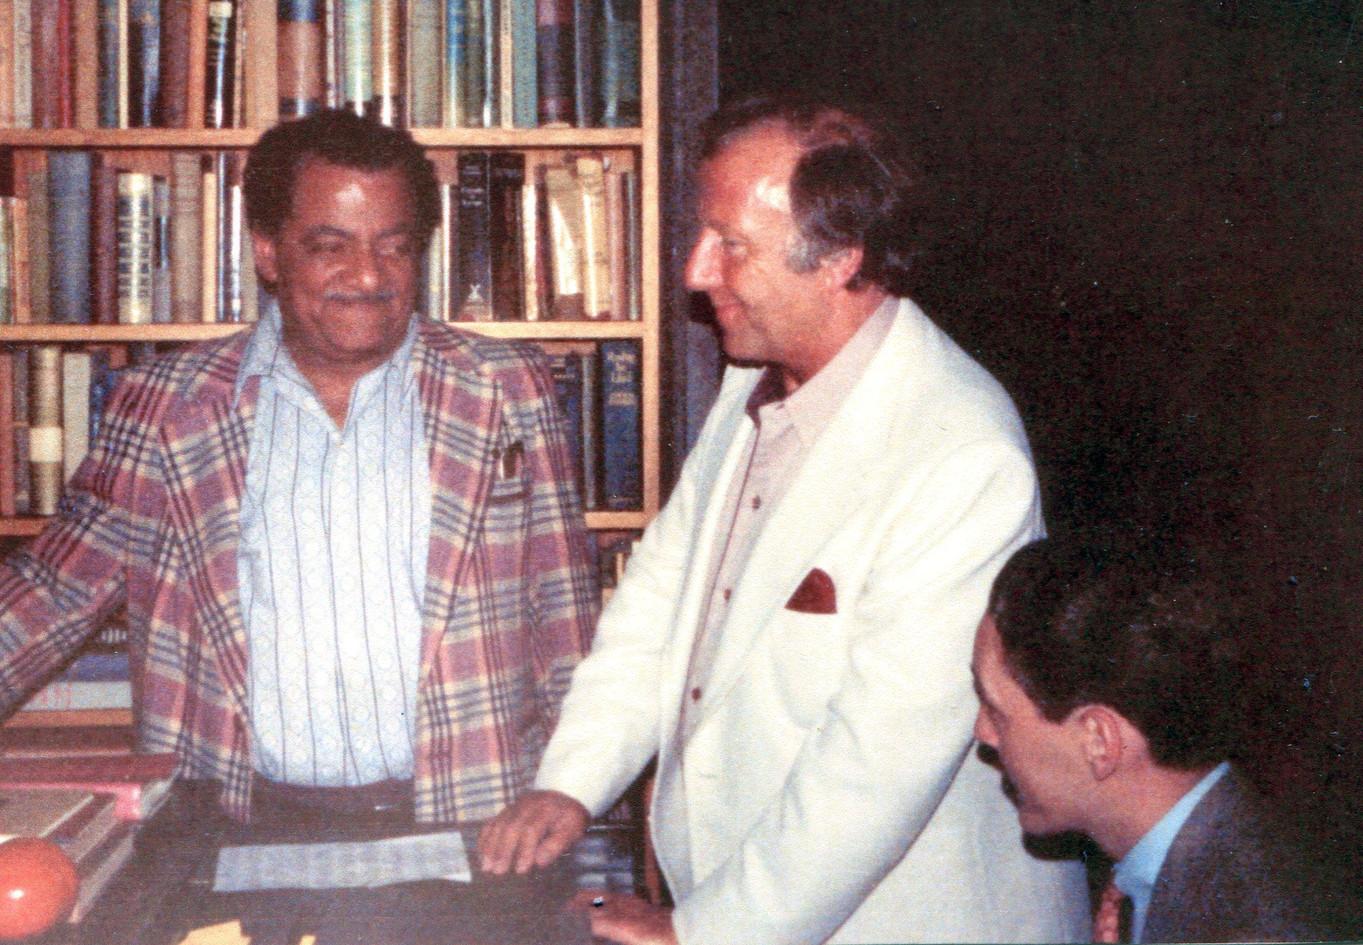 With Teddy Wilson, George Shearing, Berkeley